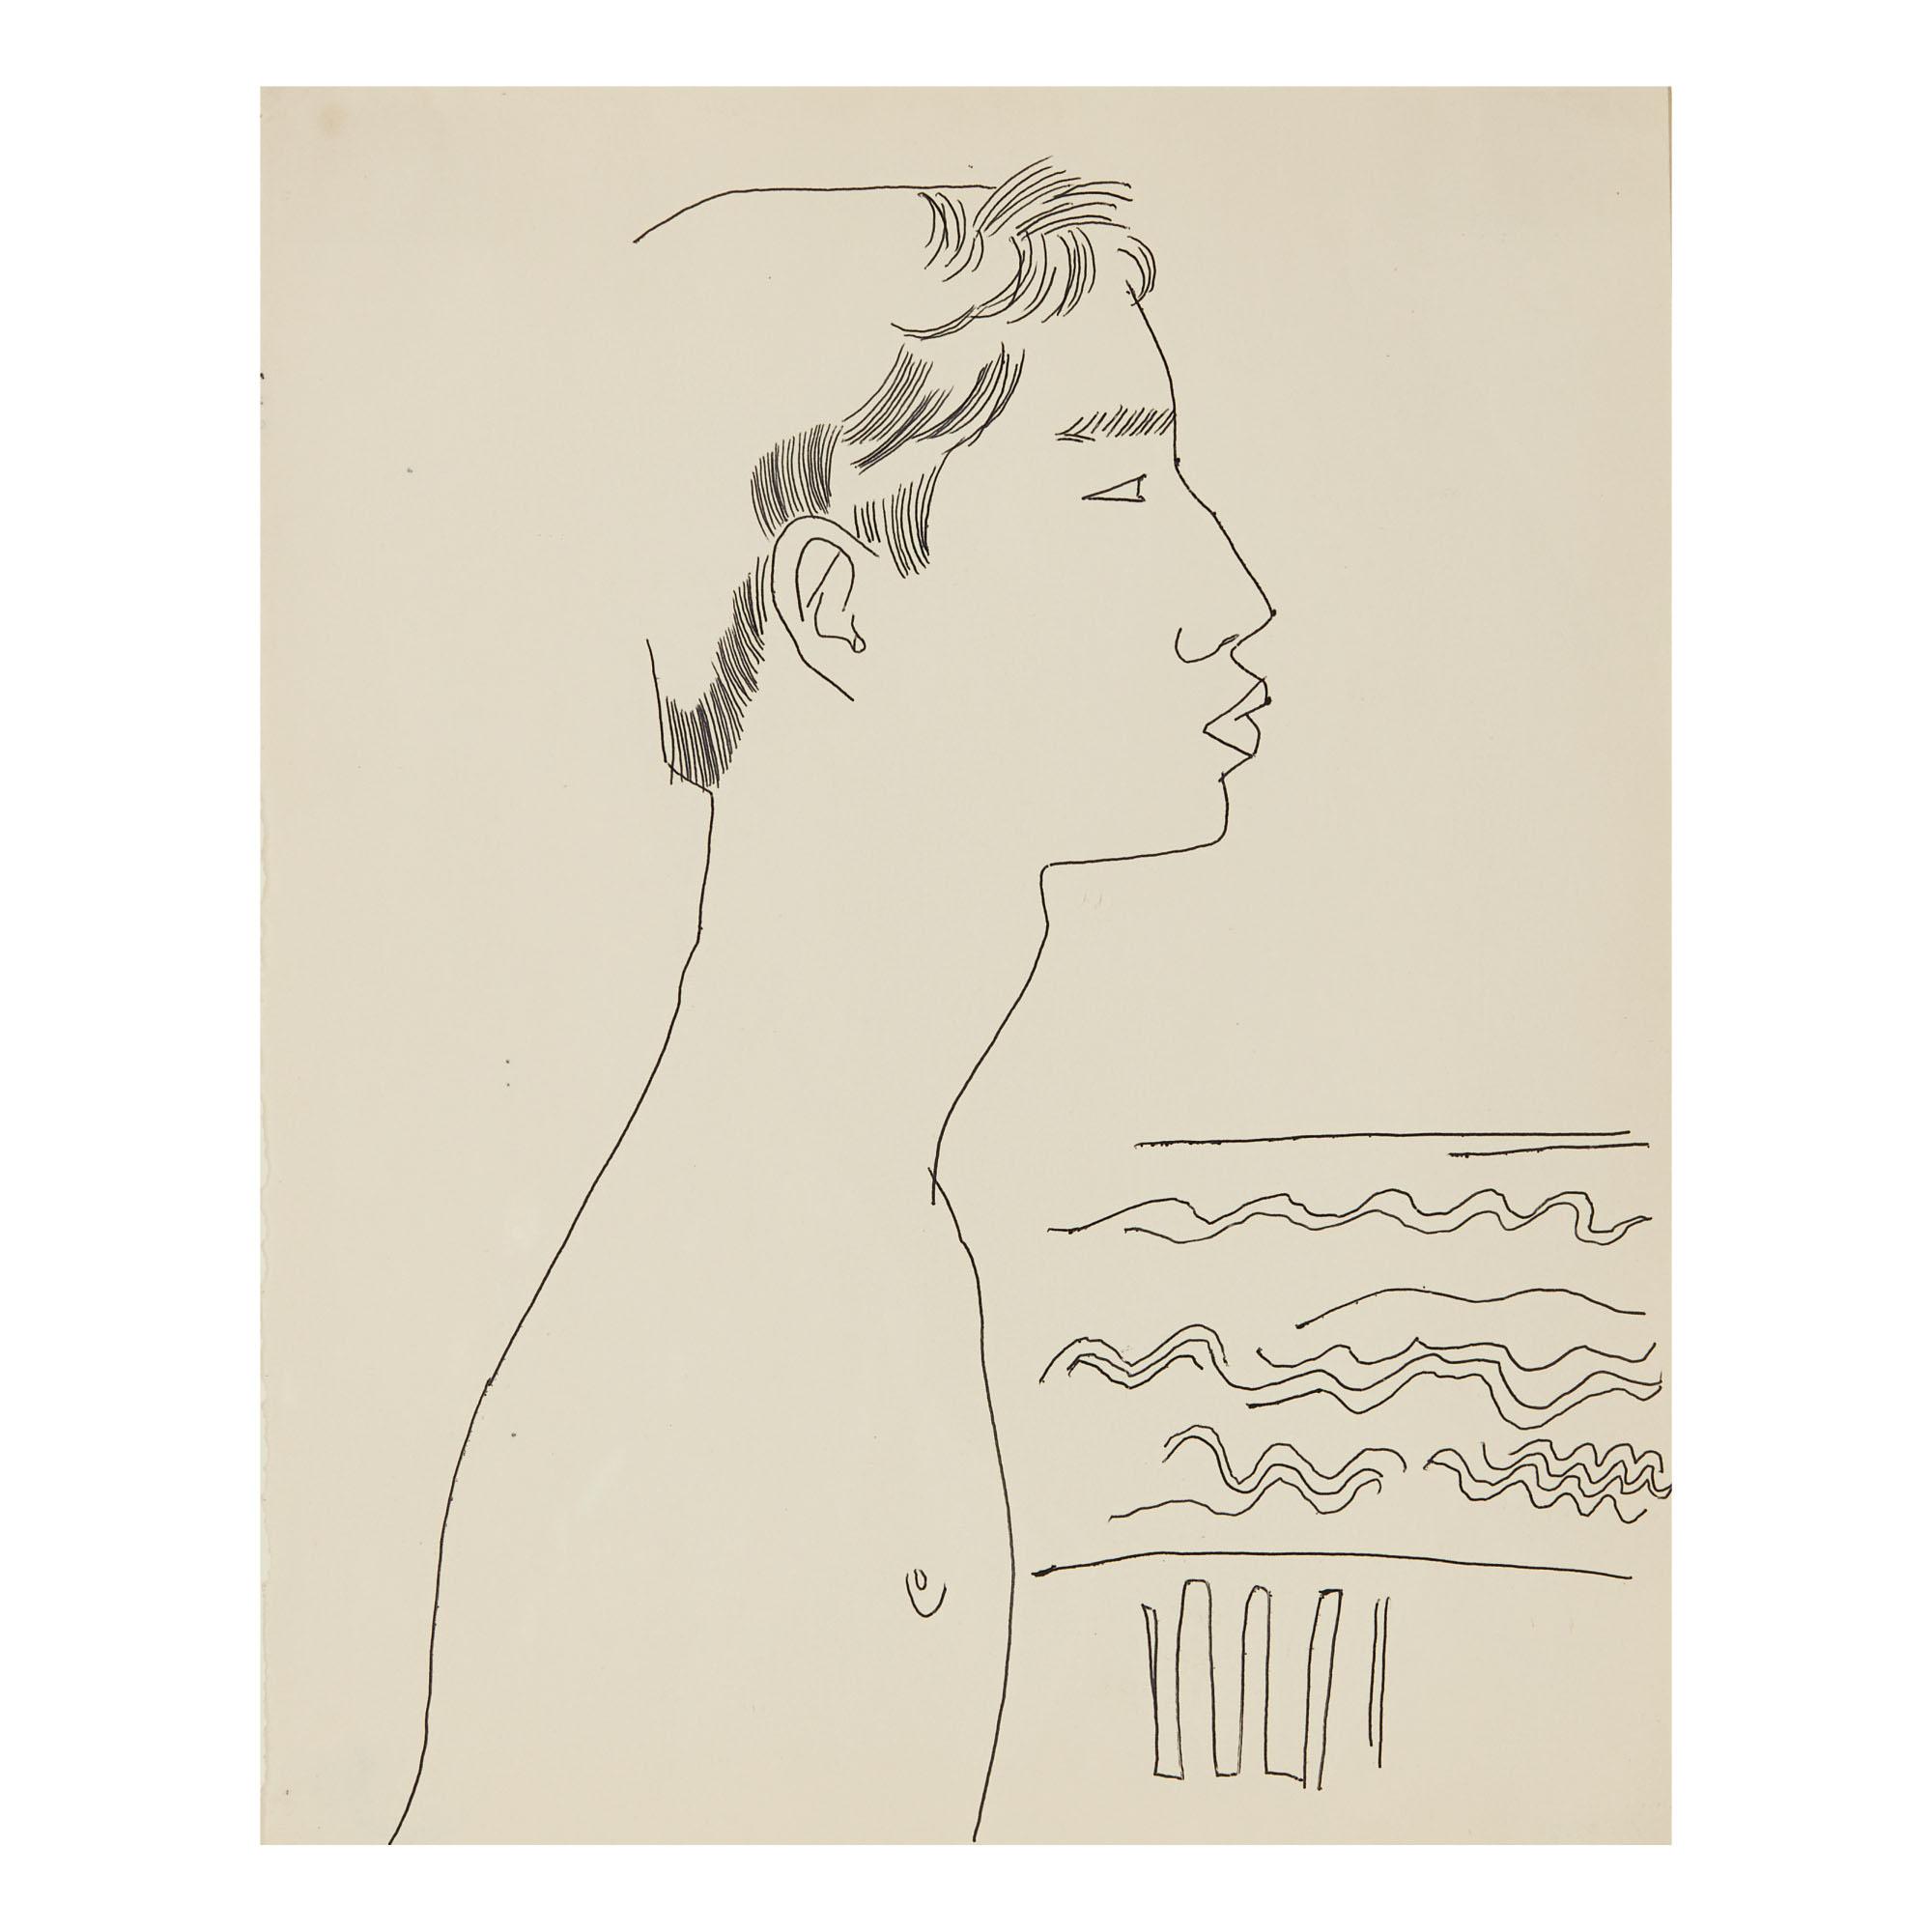 ANDY WARHOL | MALE PROFILE BY SEA